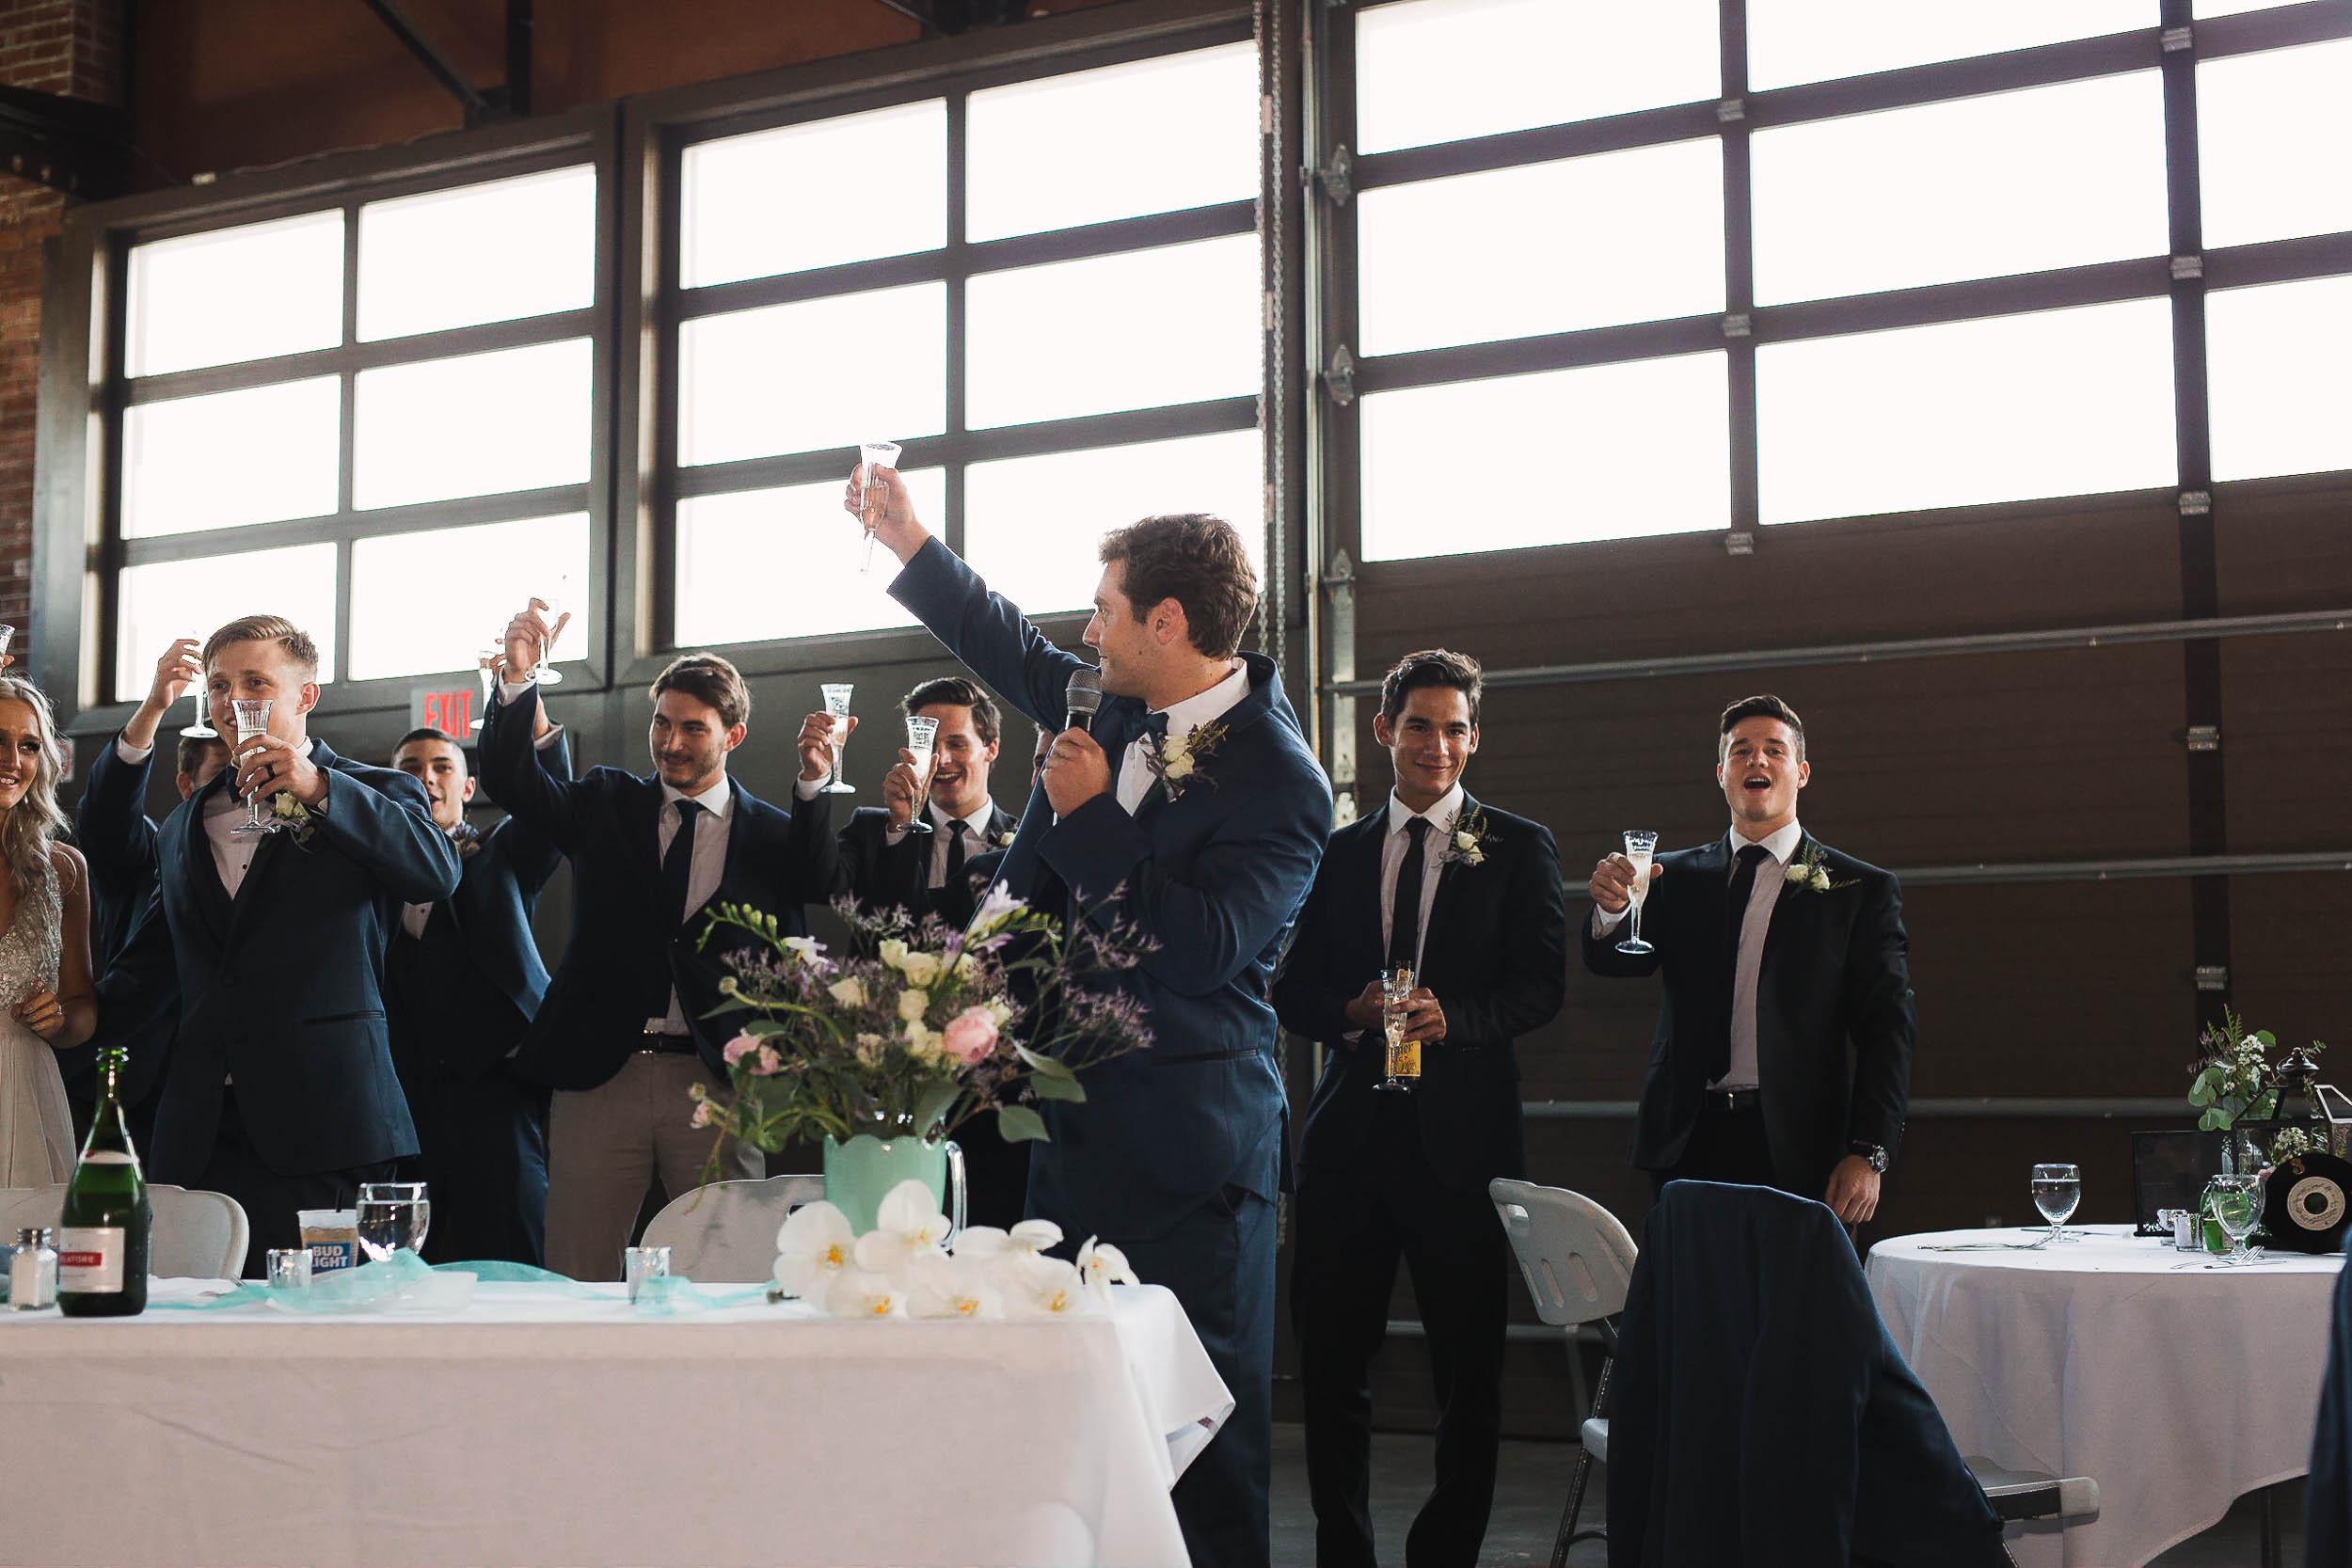 KyleLovesTori-Casper-Wyoming-Wedding-114.jpg